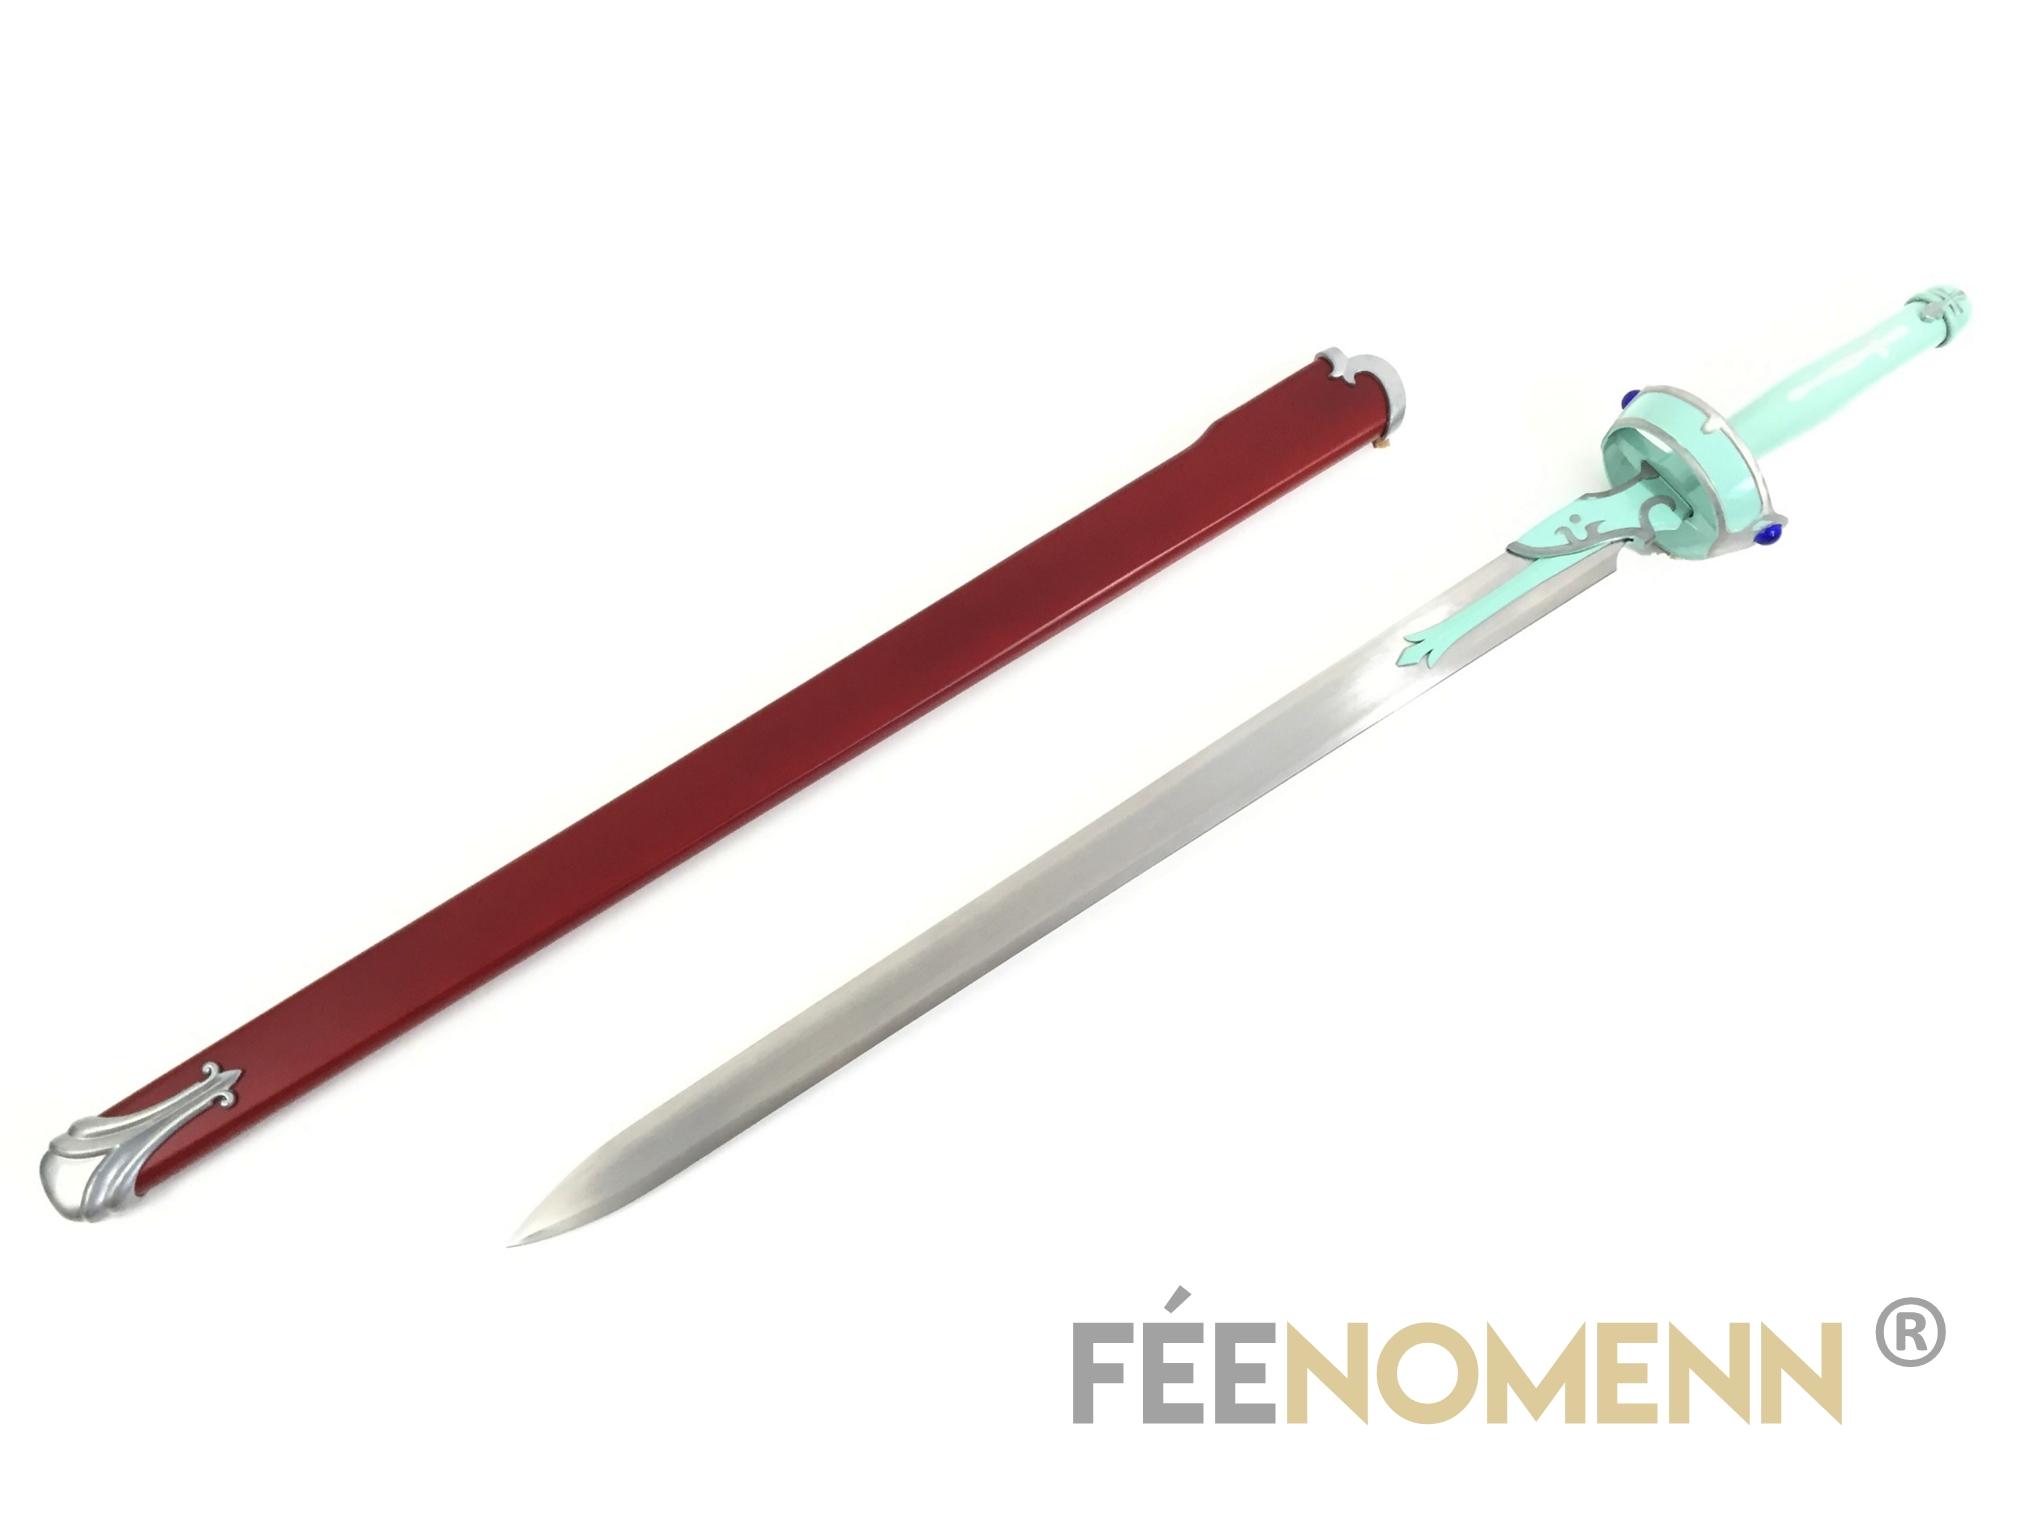 SWORD ART ONLINE - Réplique Épée ASUNA